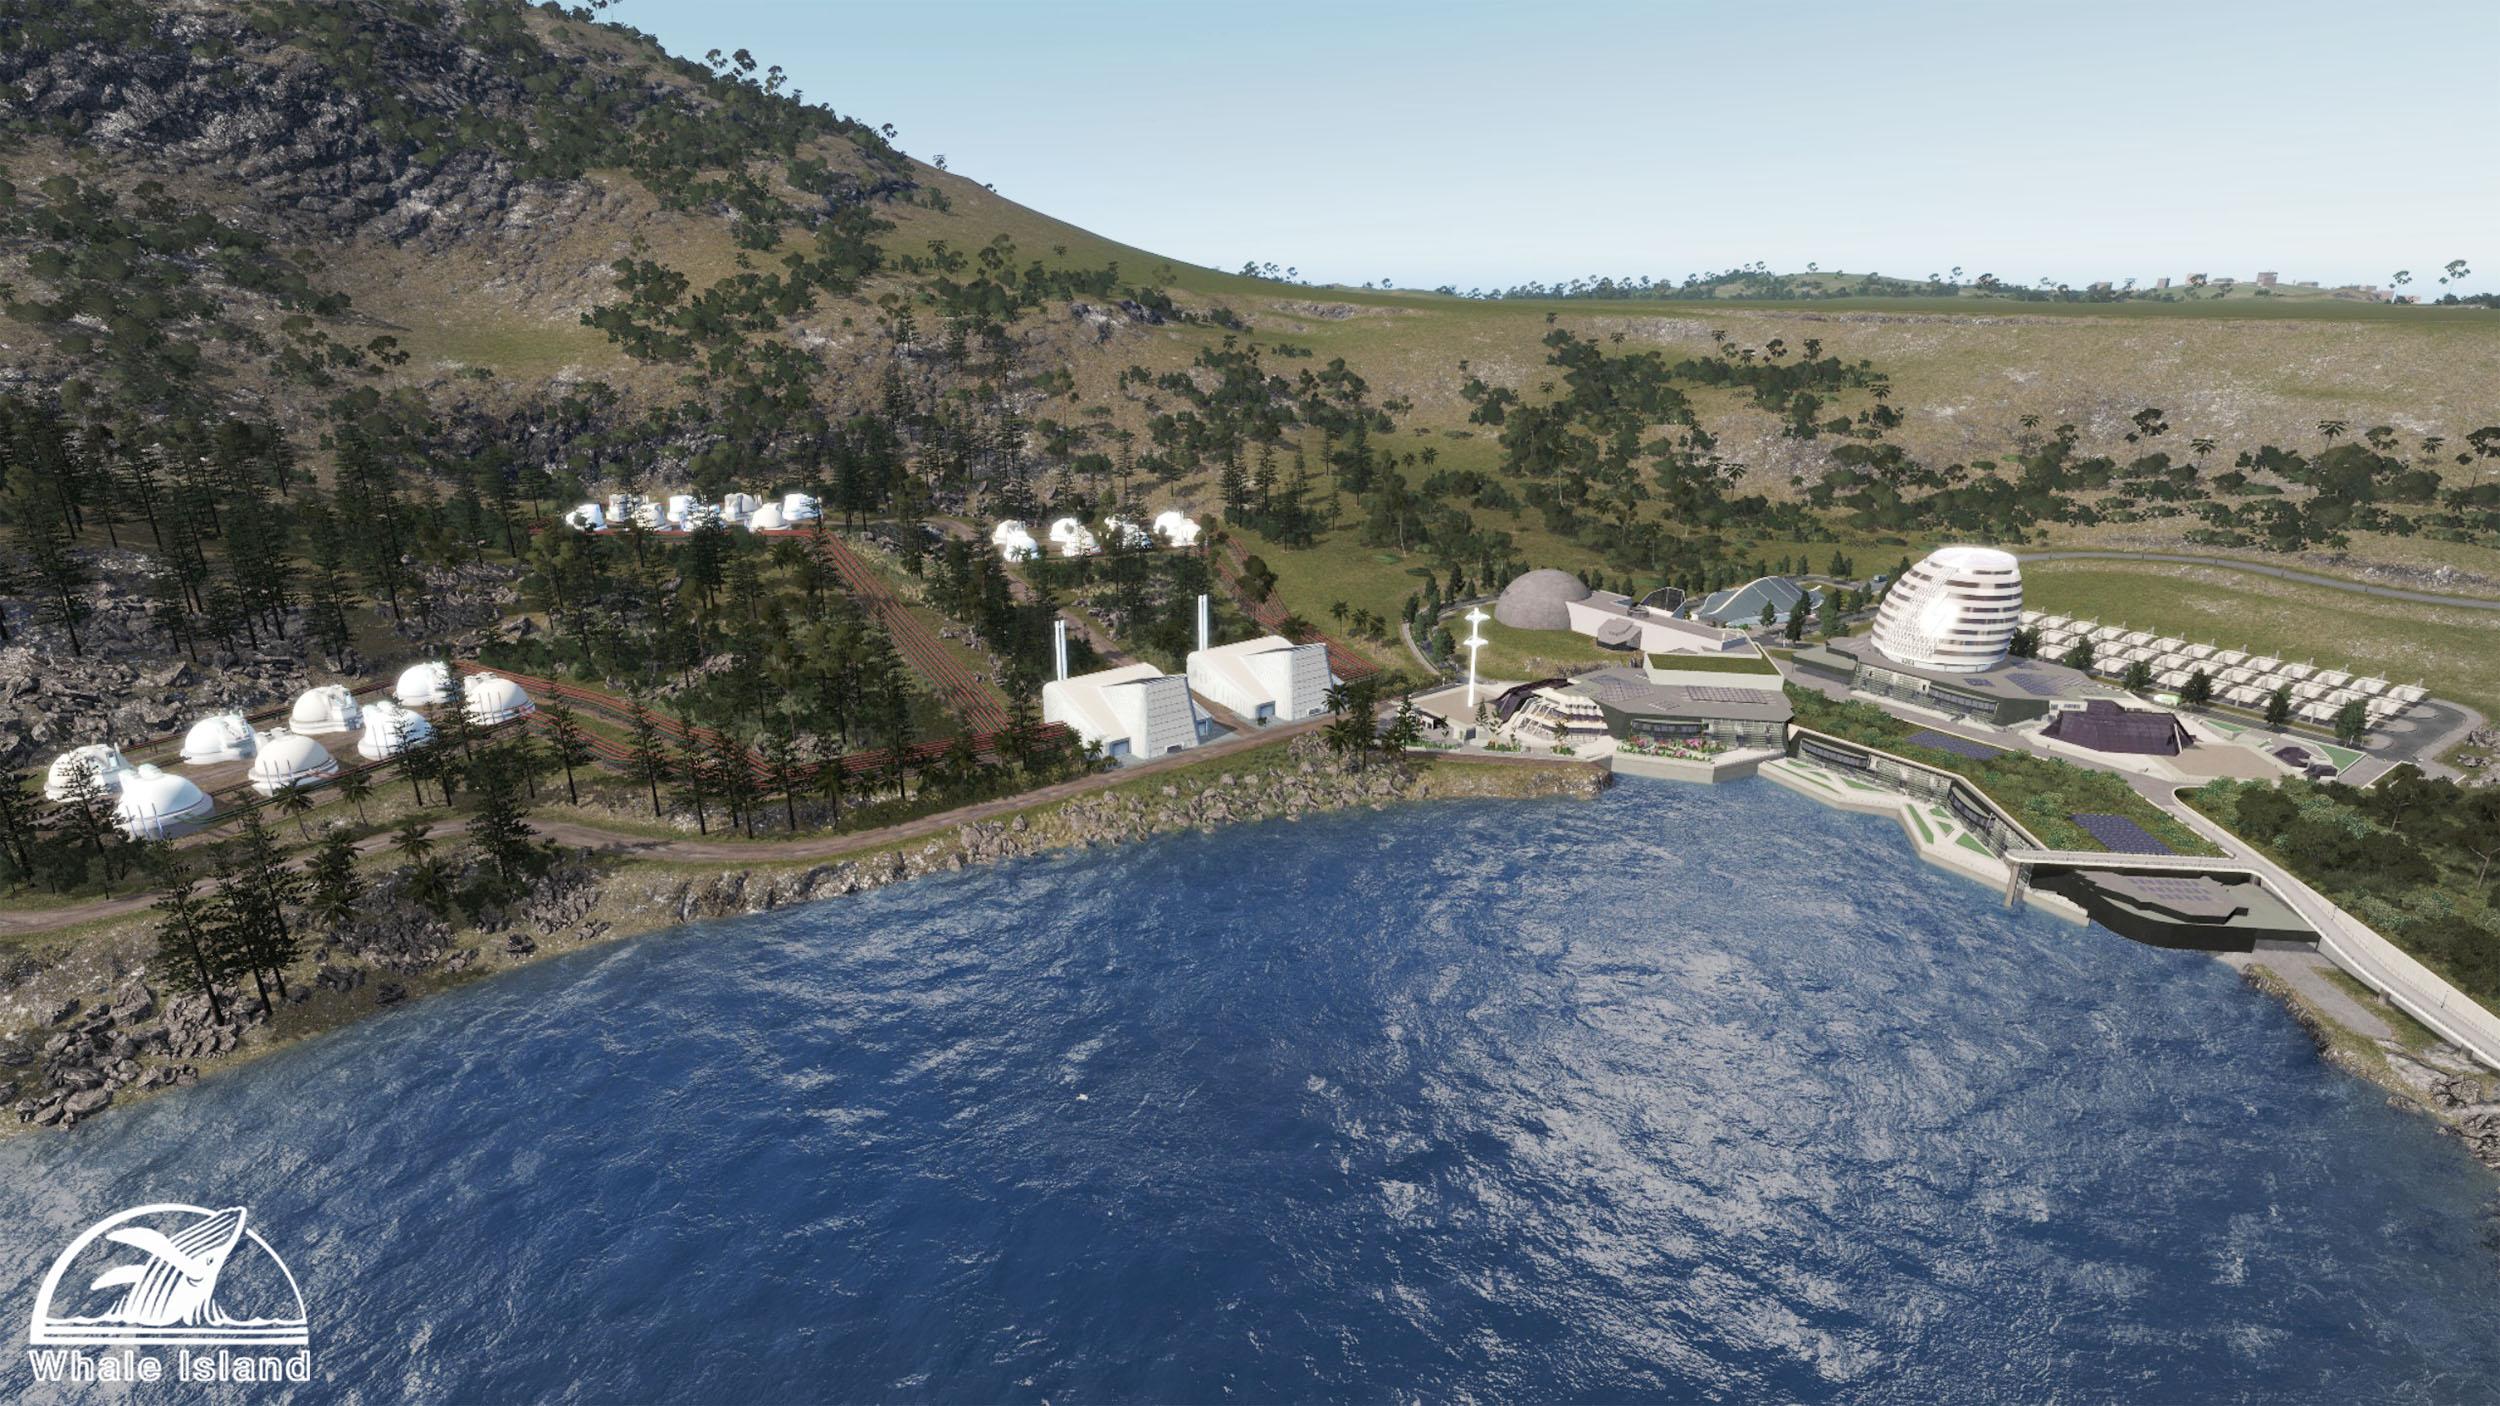 Whale Island - Work in Progress! - Page 22 NREI-01